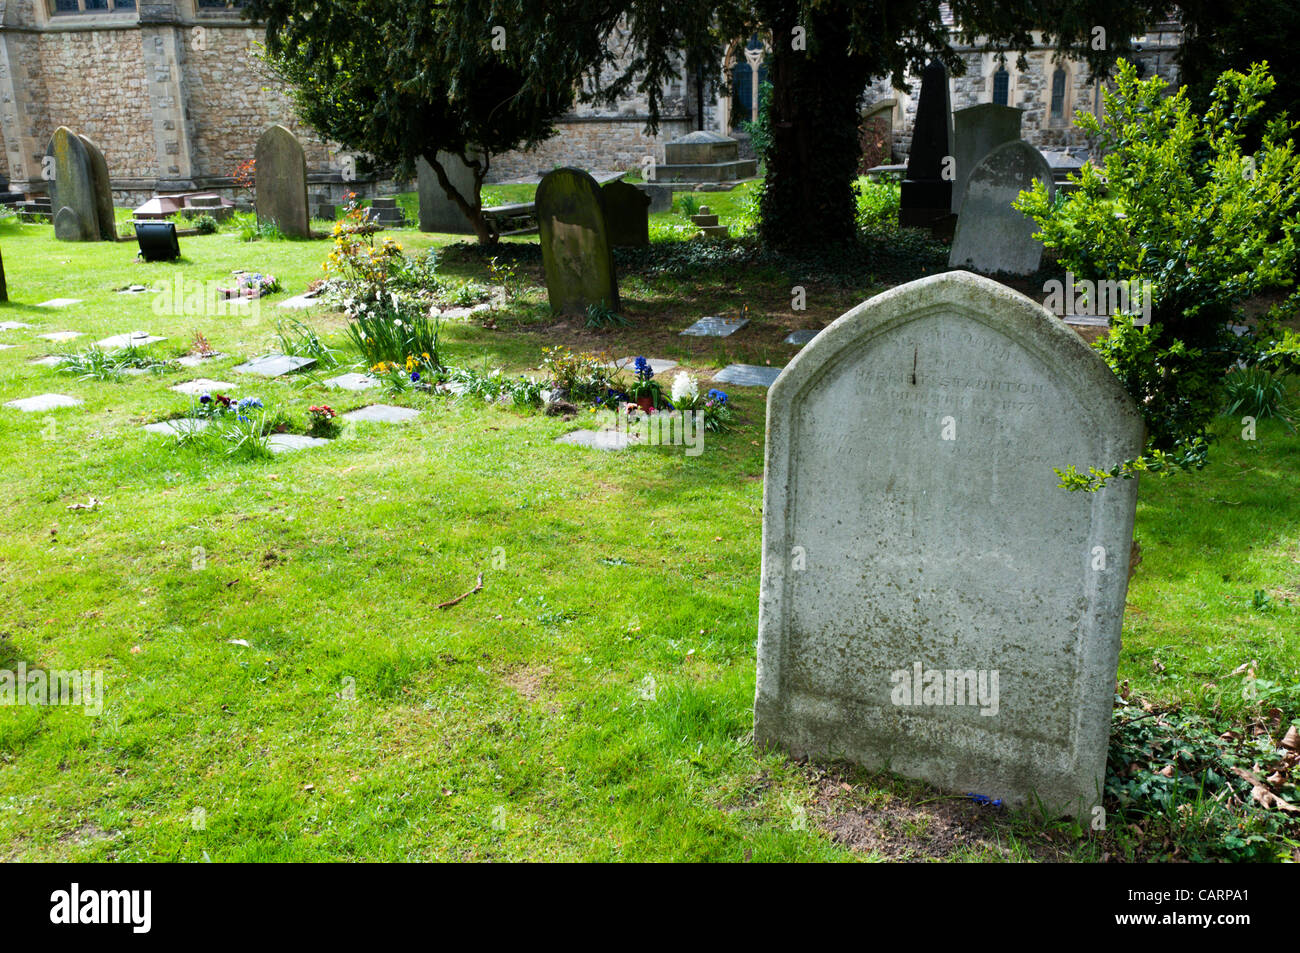 BECKENHAM, UK, 15 Apr 2012. 'Harriet' by Elizabeth Jenkins to be published on 19 April 2012.  Originally - Stock Image